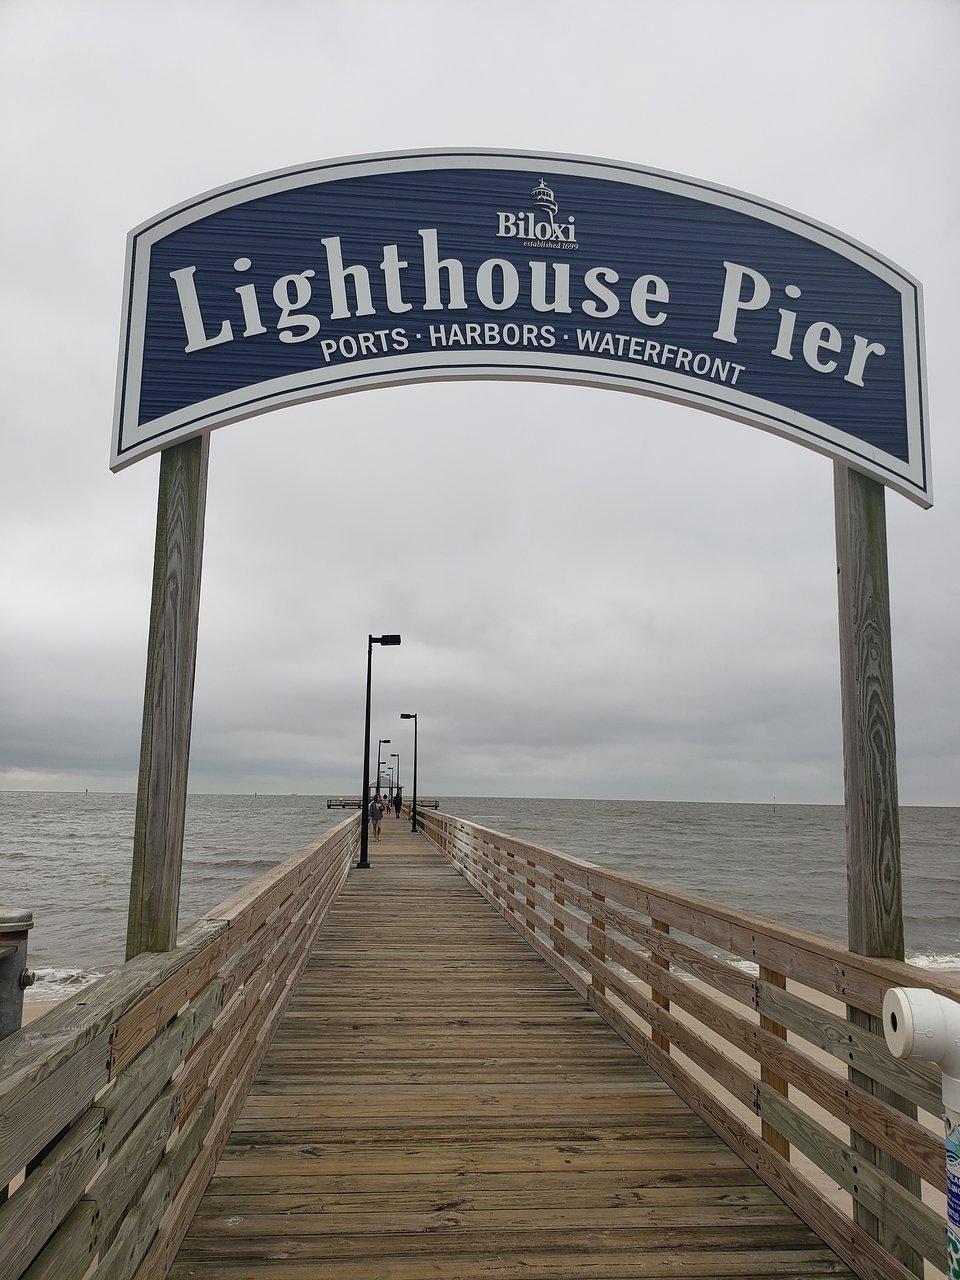 Biloxi Lighthouse Pier 2020 All You Need To Know Before You Go With Photos Tripadvisor